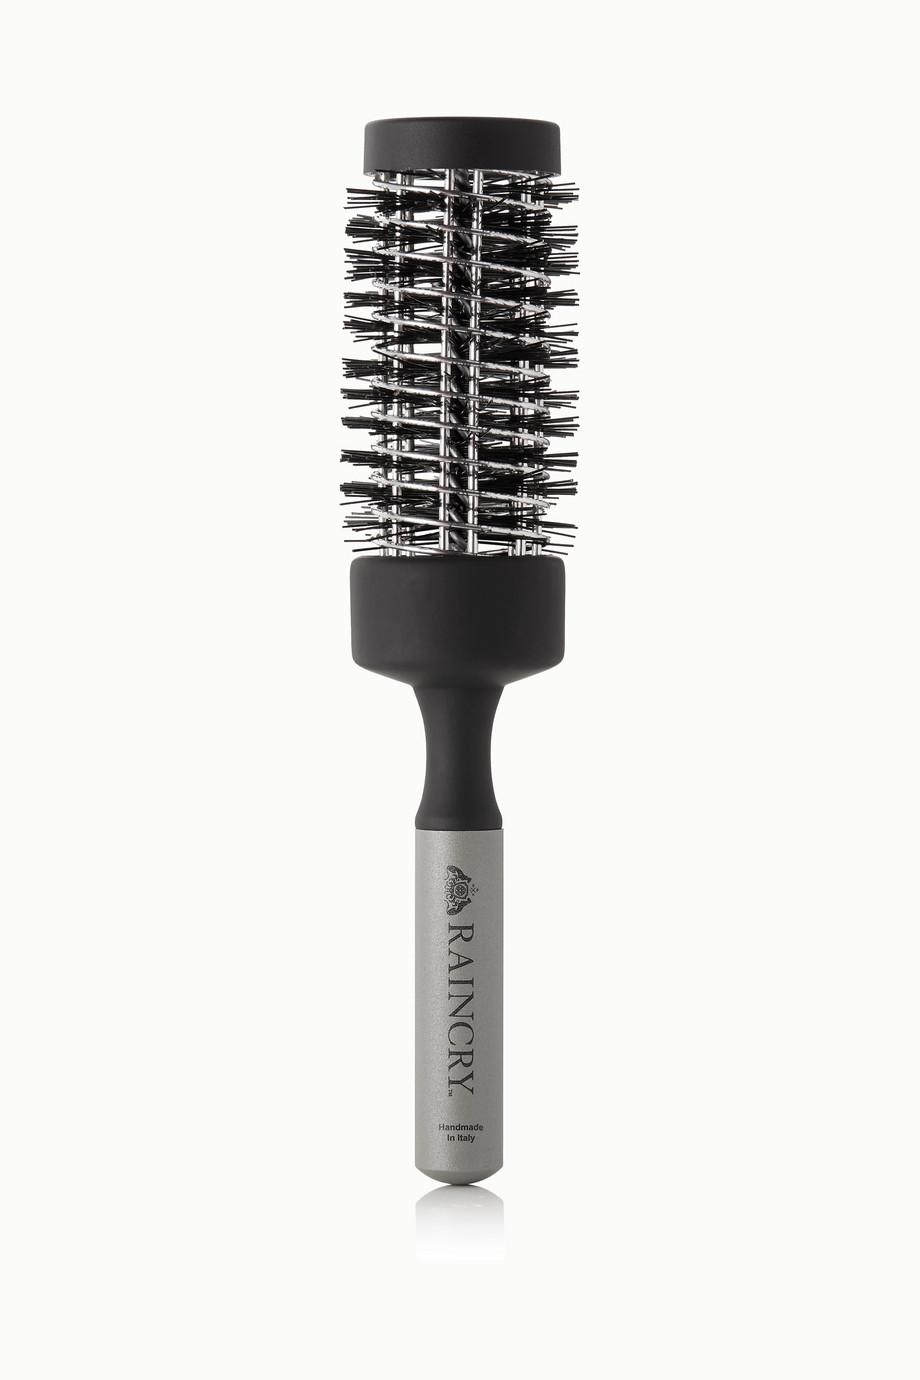 RAINCRY Volume Large Magnesium Hairbrush